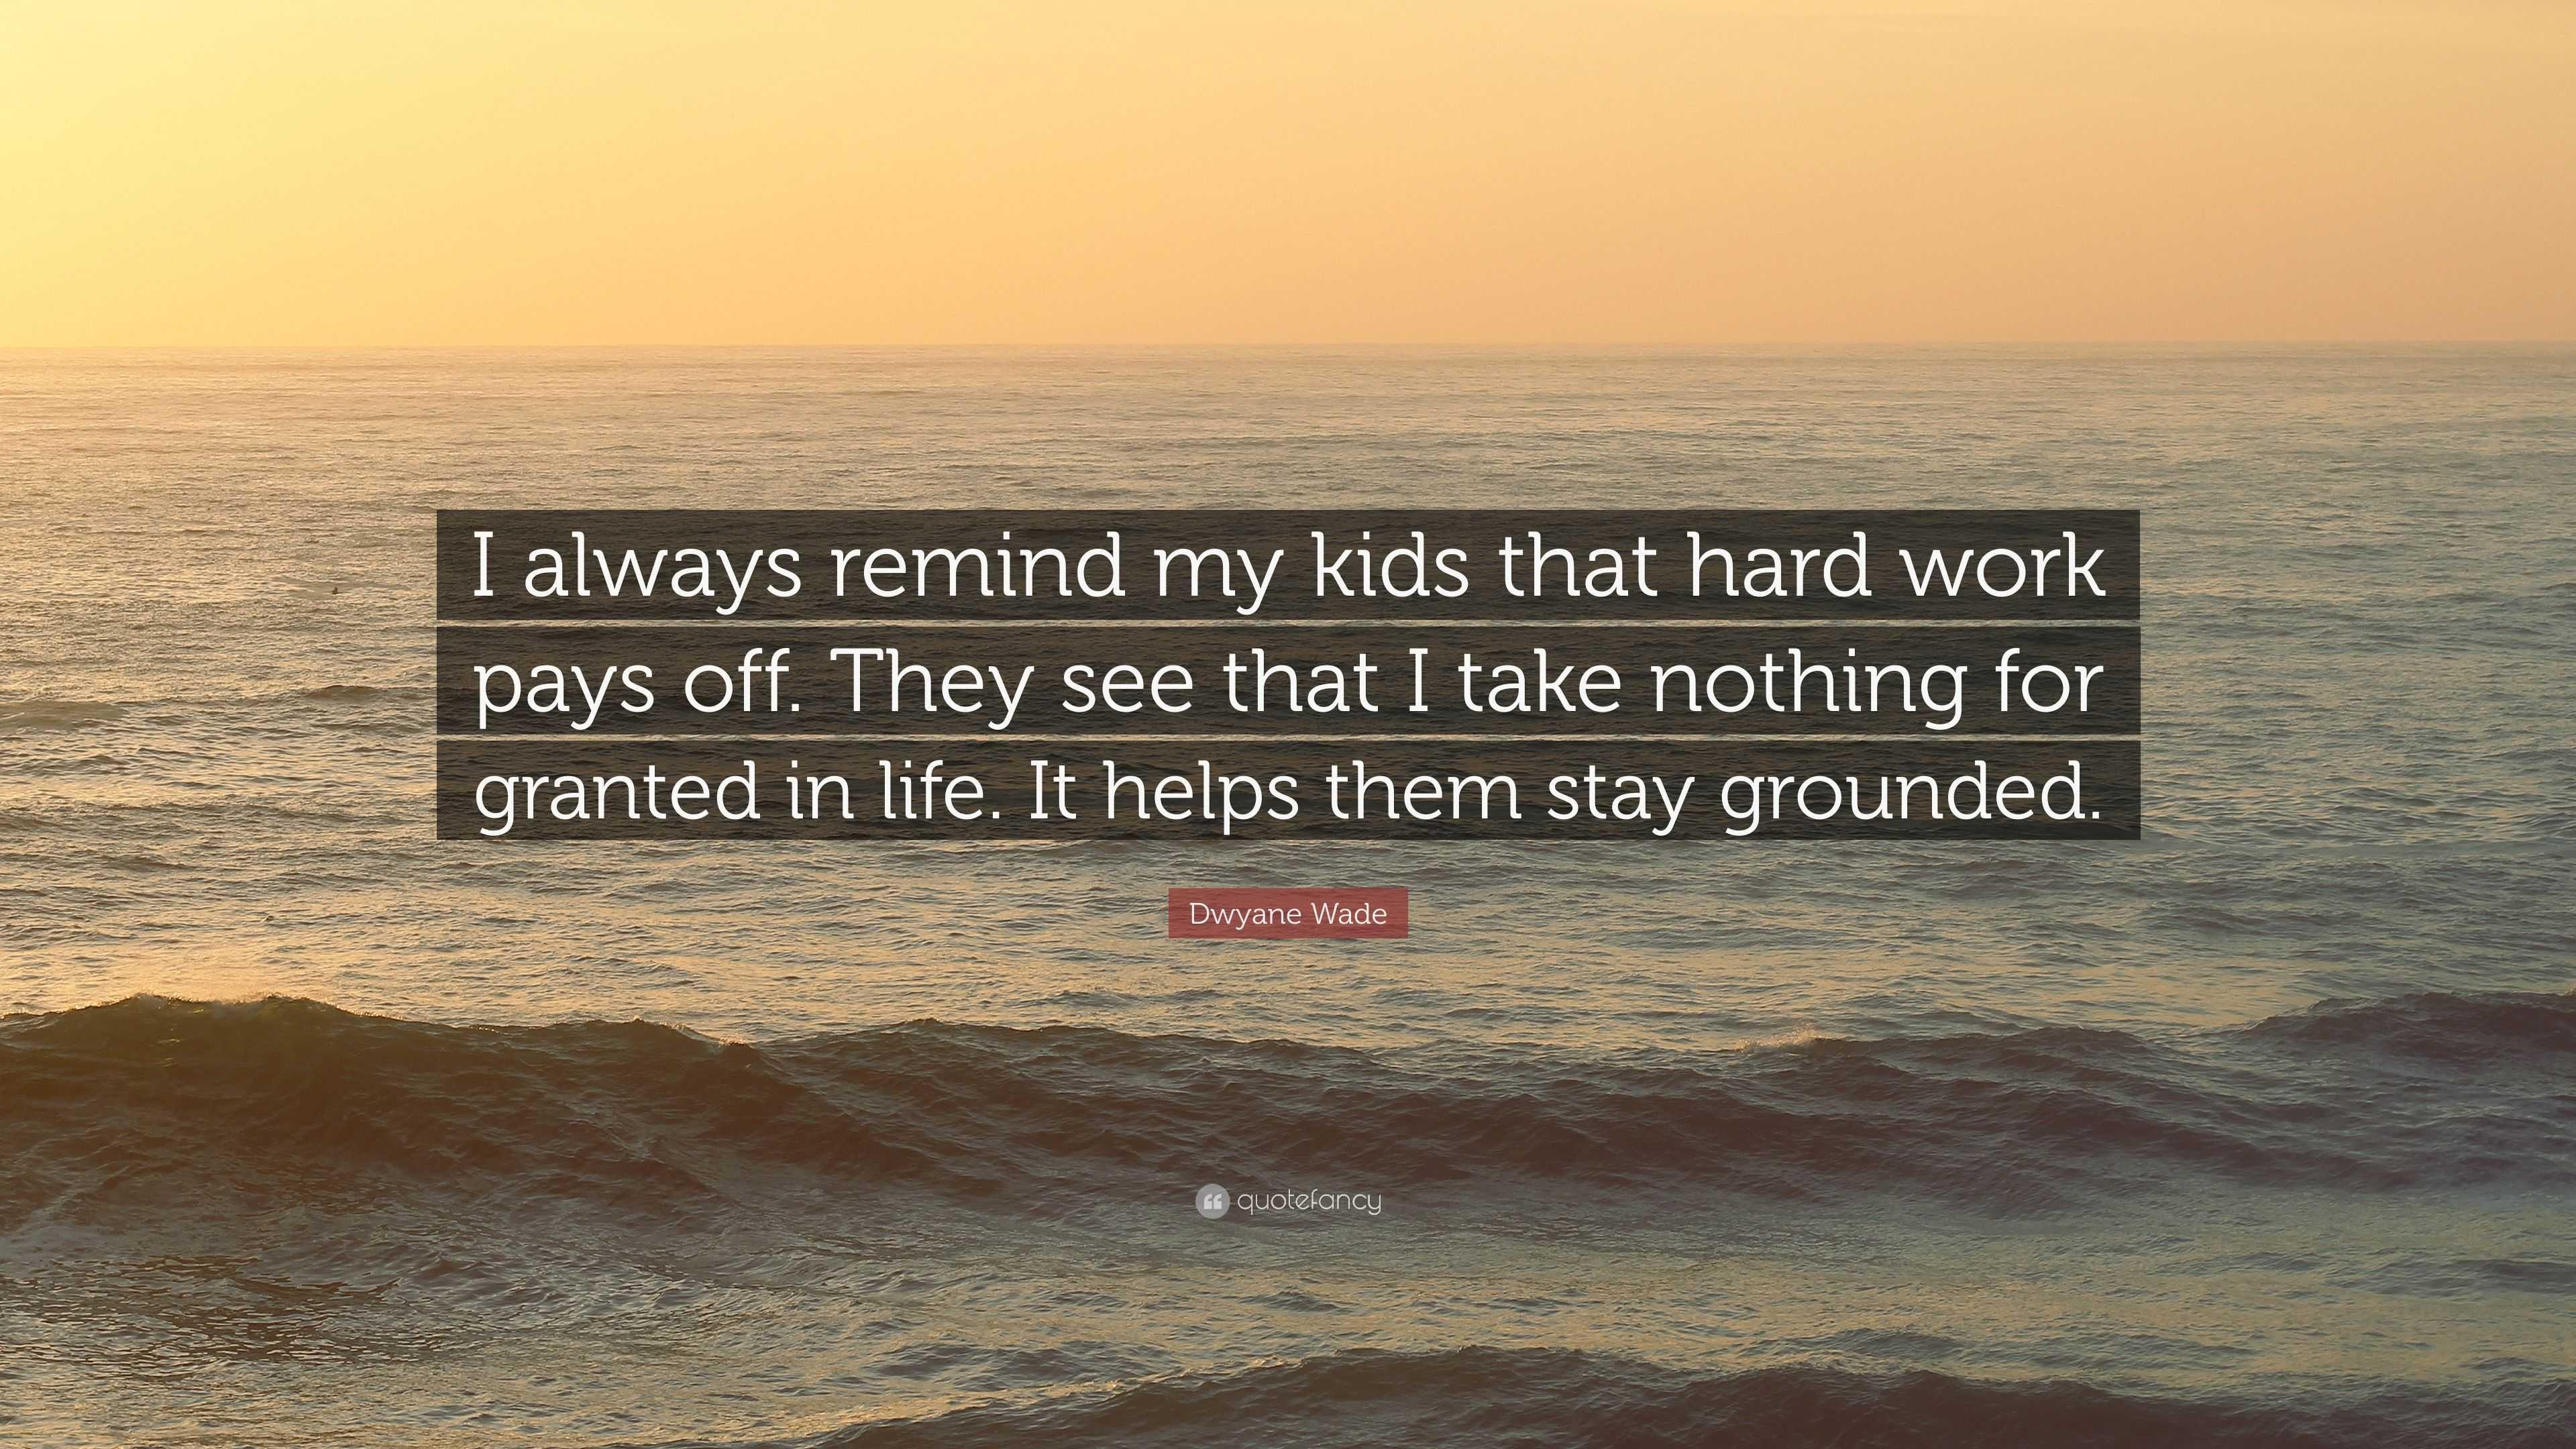 Good Dwyane Wade Quote: U201cI Always Remind My Kids That Hard Work Pays Off.